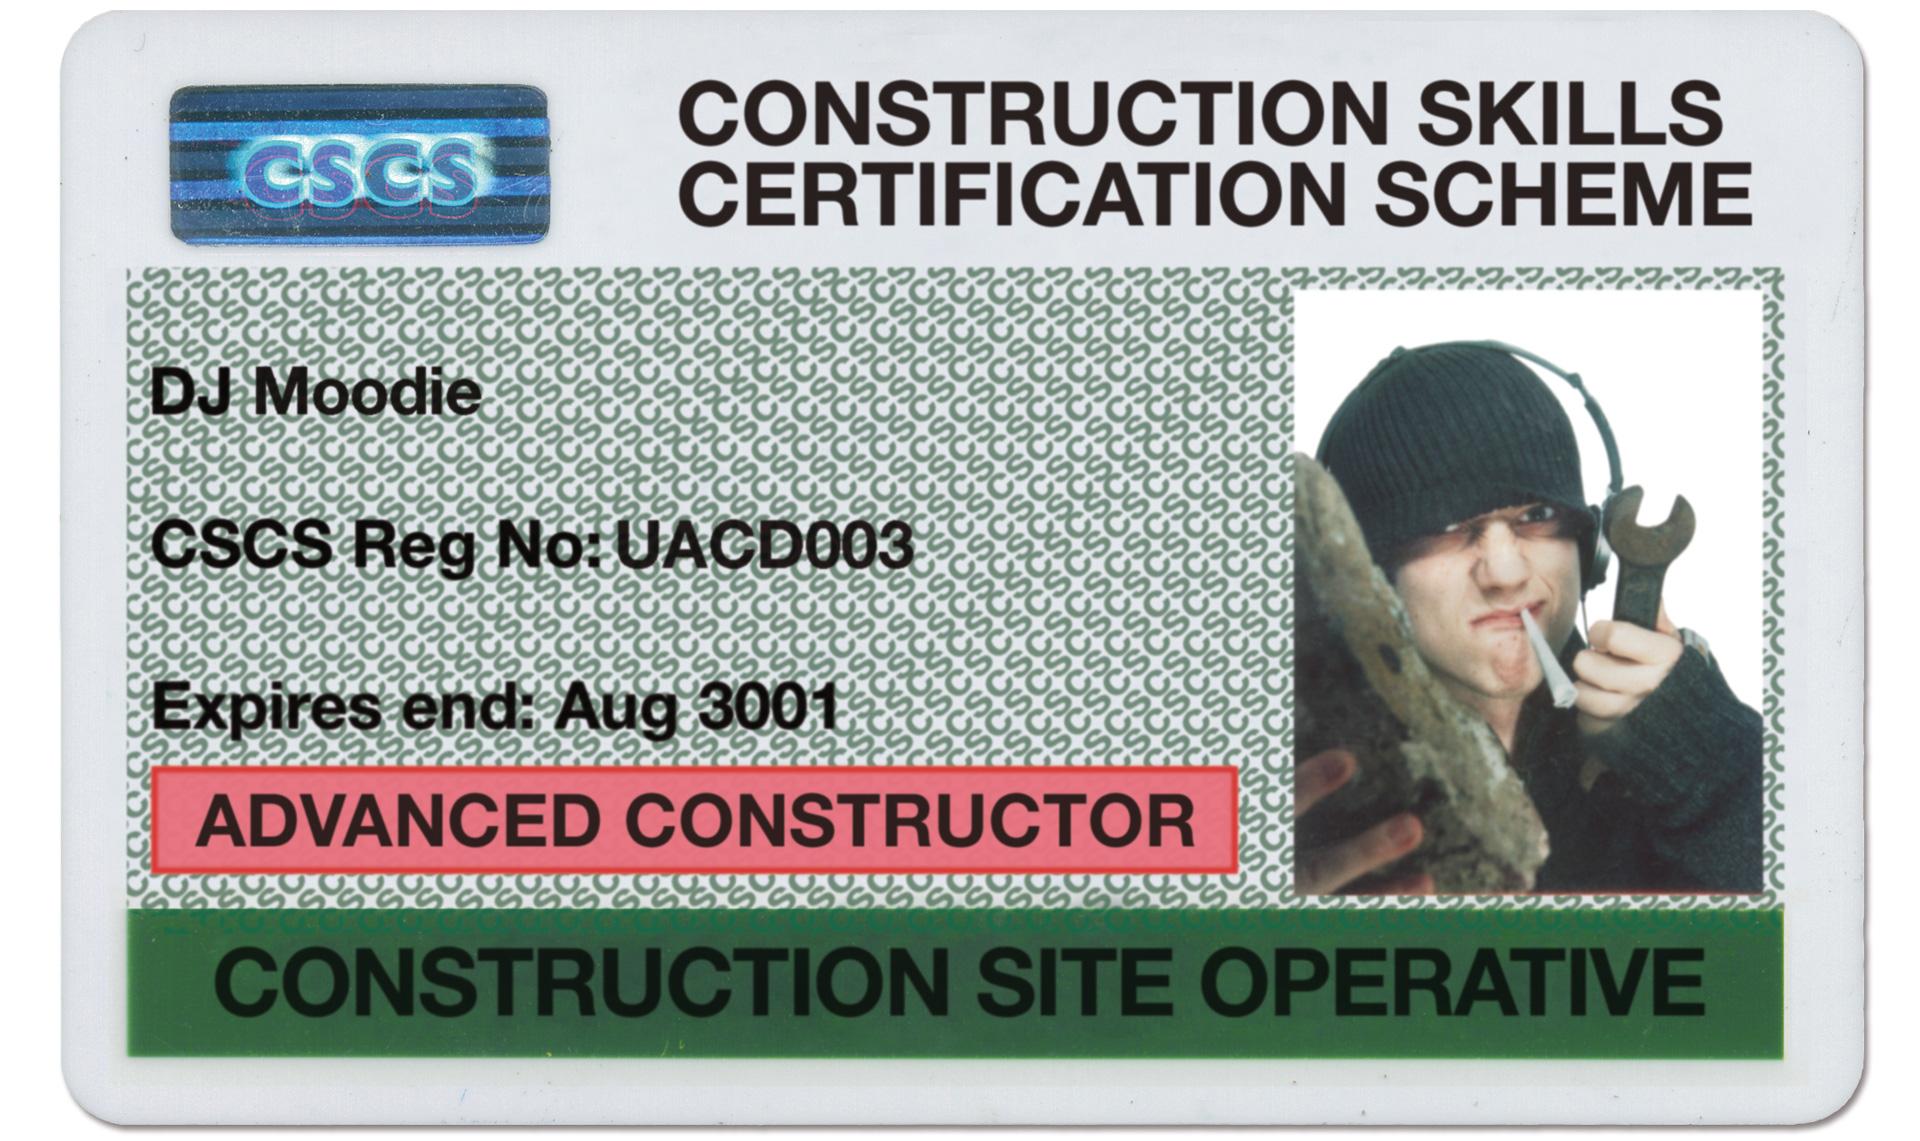 DJ Moodie CSCS card.